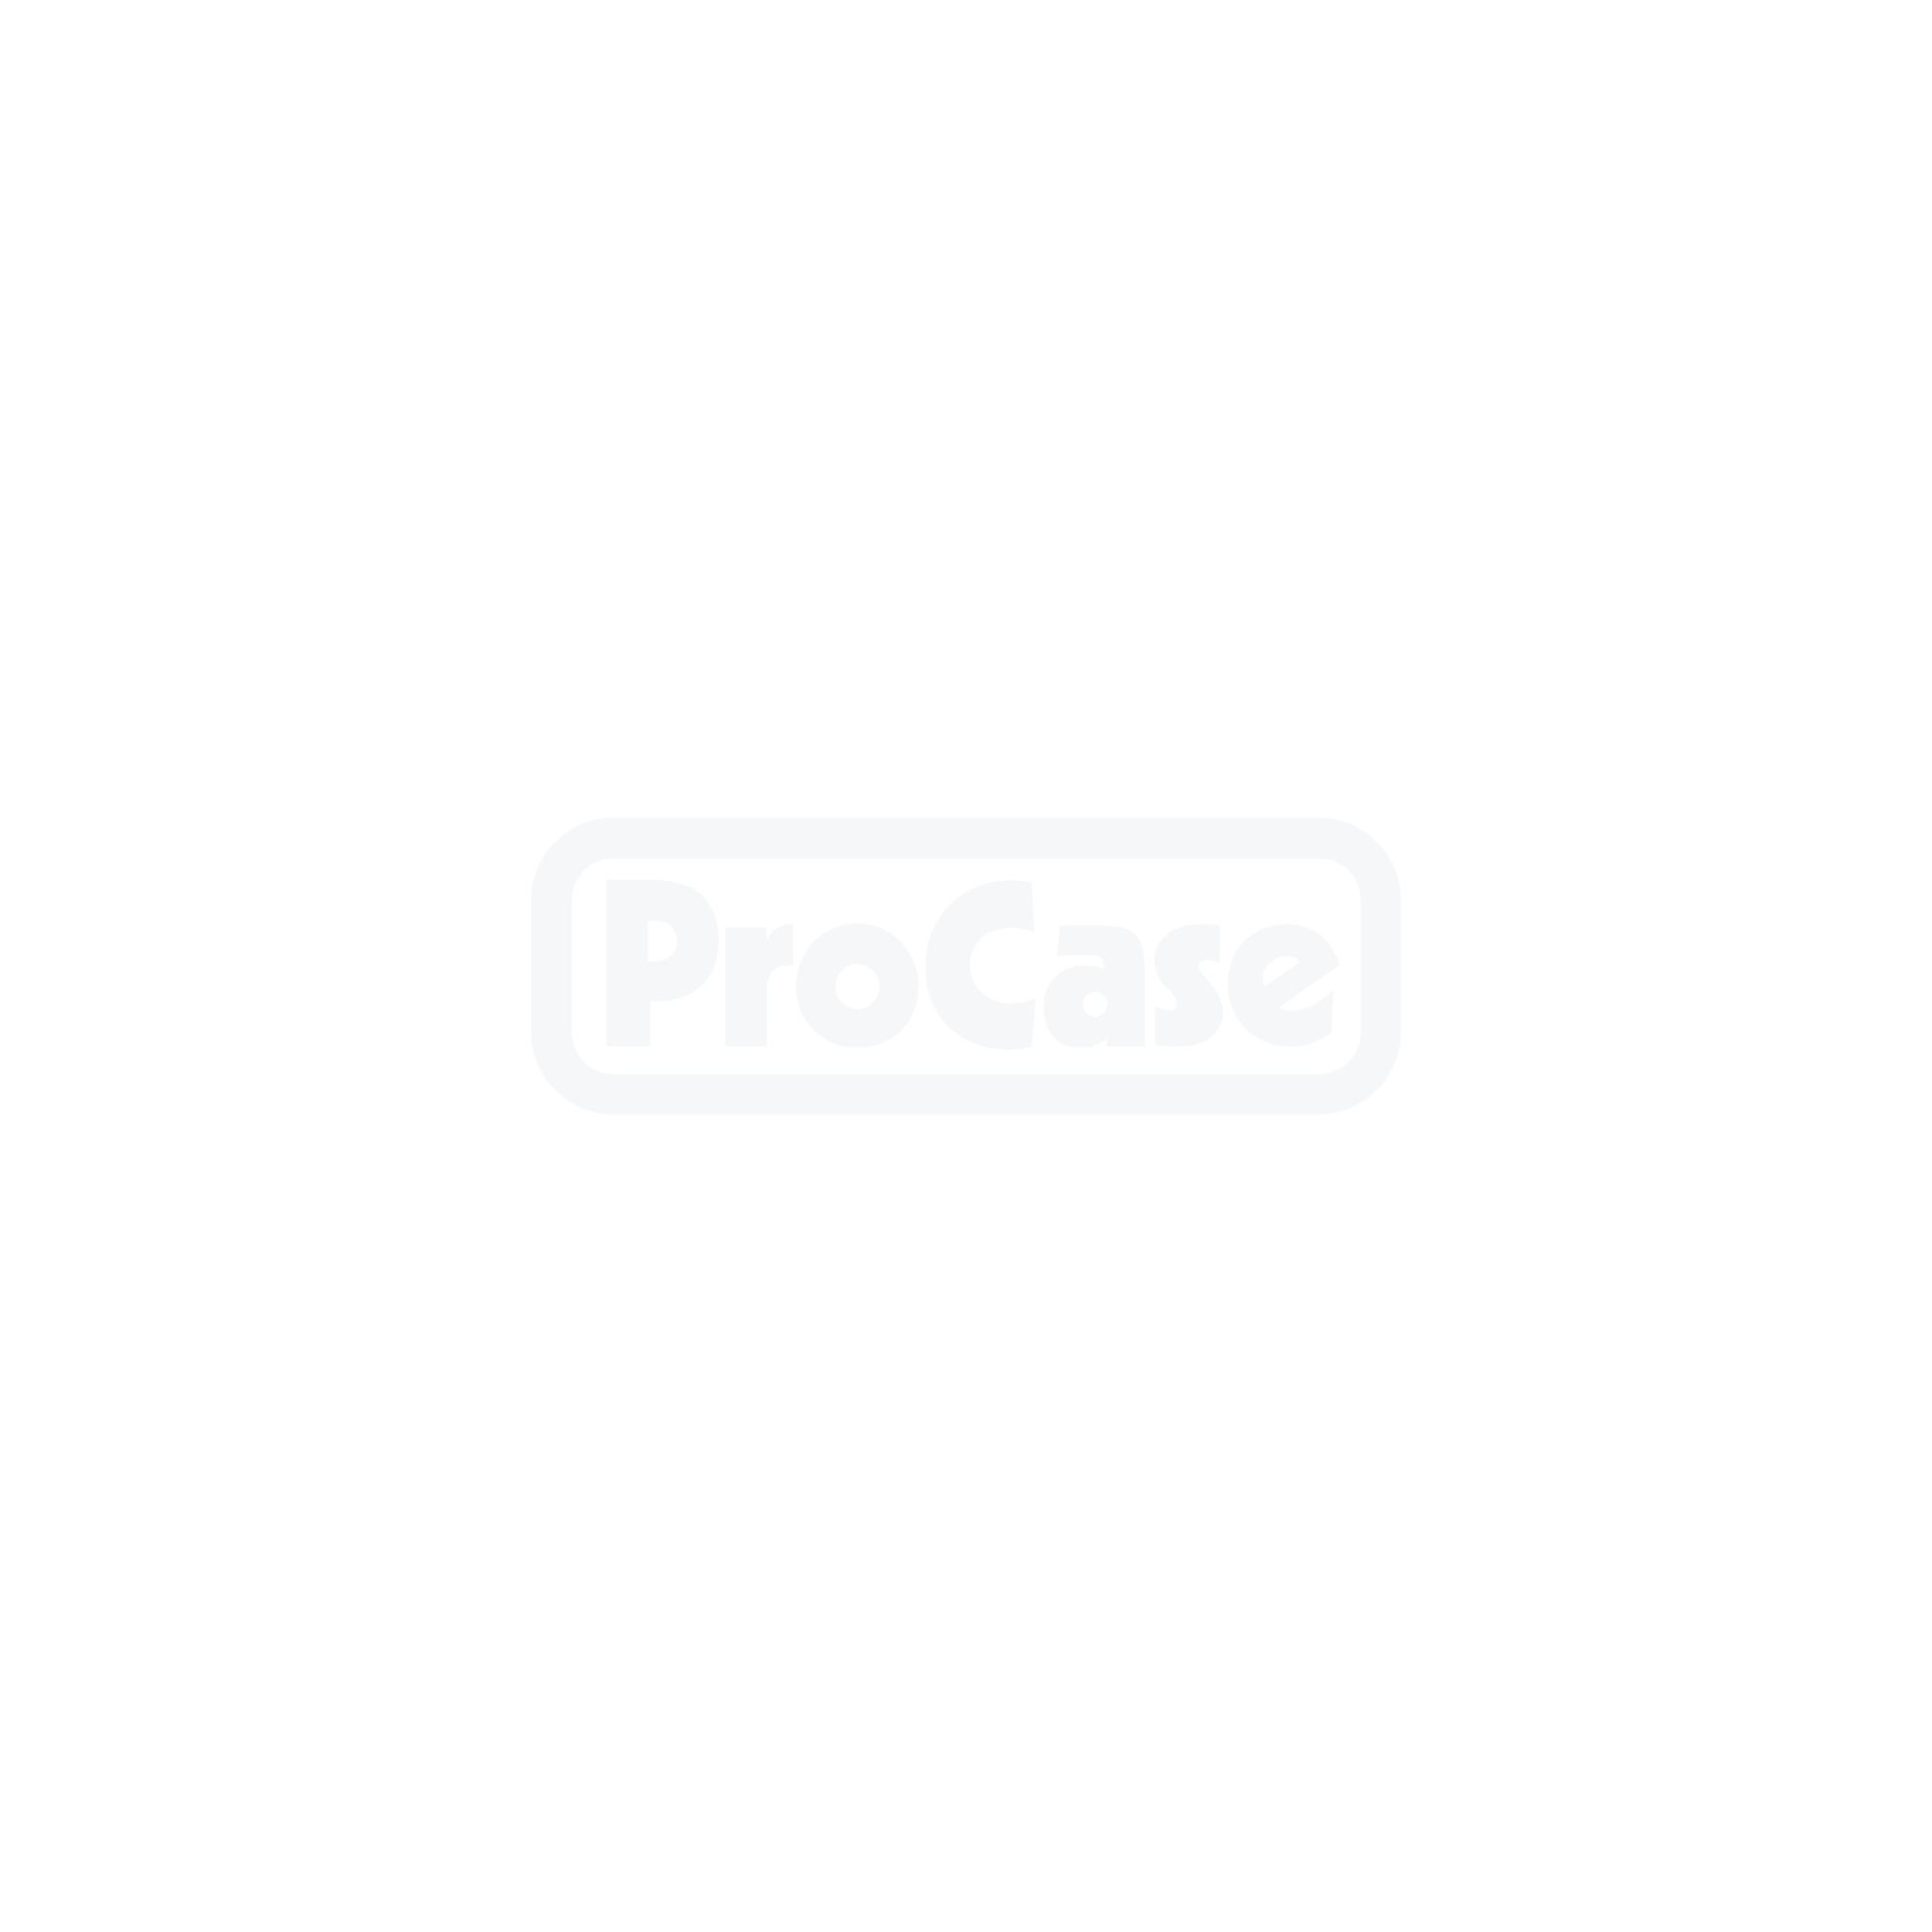 Flightcase für 4 RCF V-BR NX 45 Flugrahmen 2